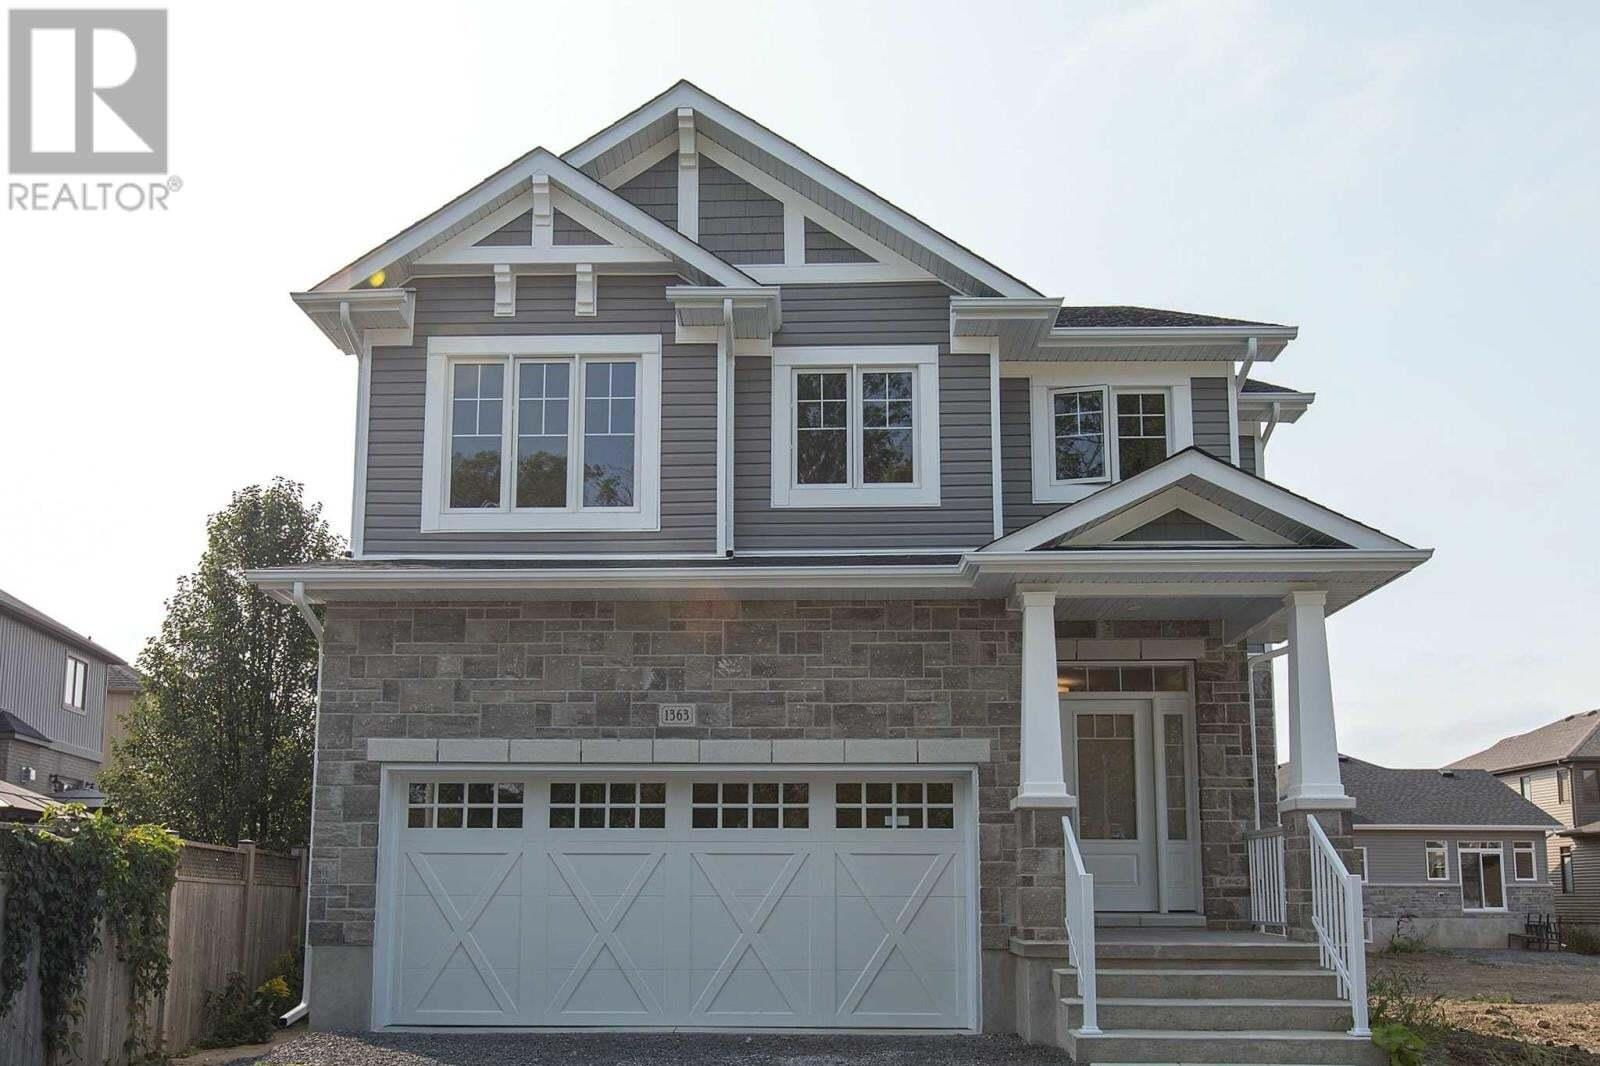 House for sale at 1363 Andersen Dr Kingston Ontario - MLS: K20005283